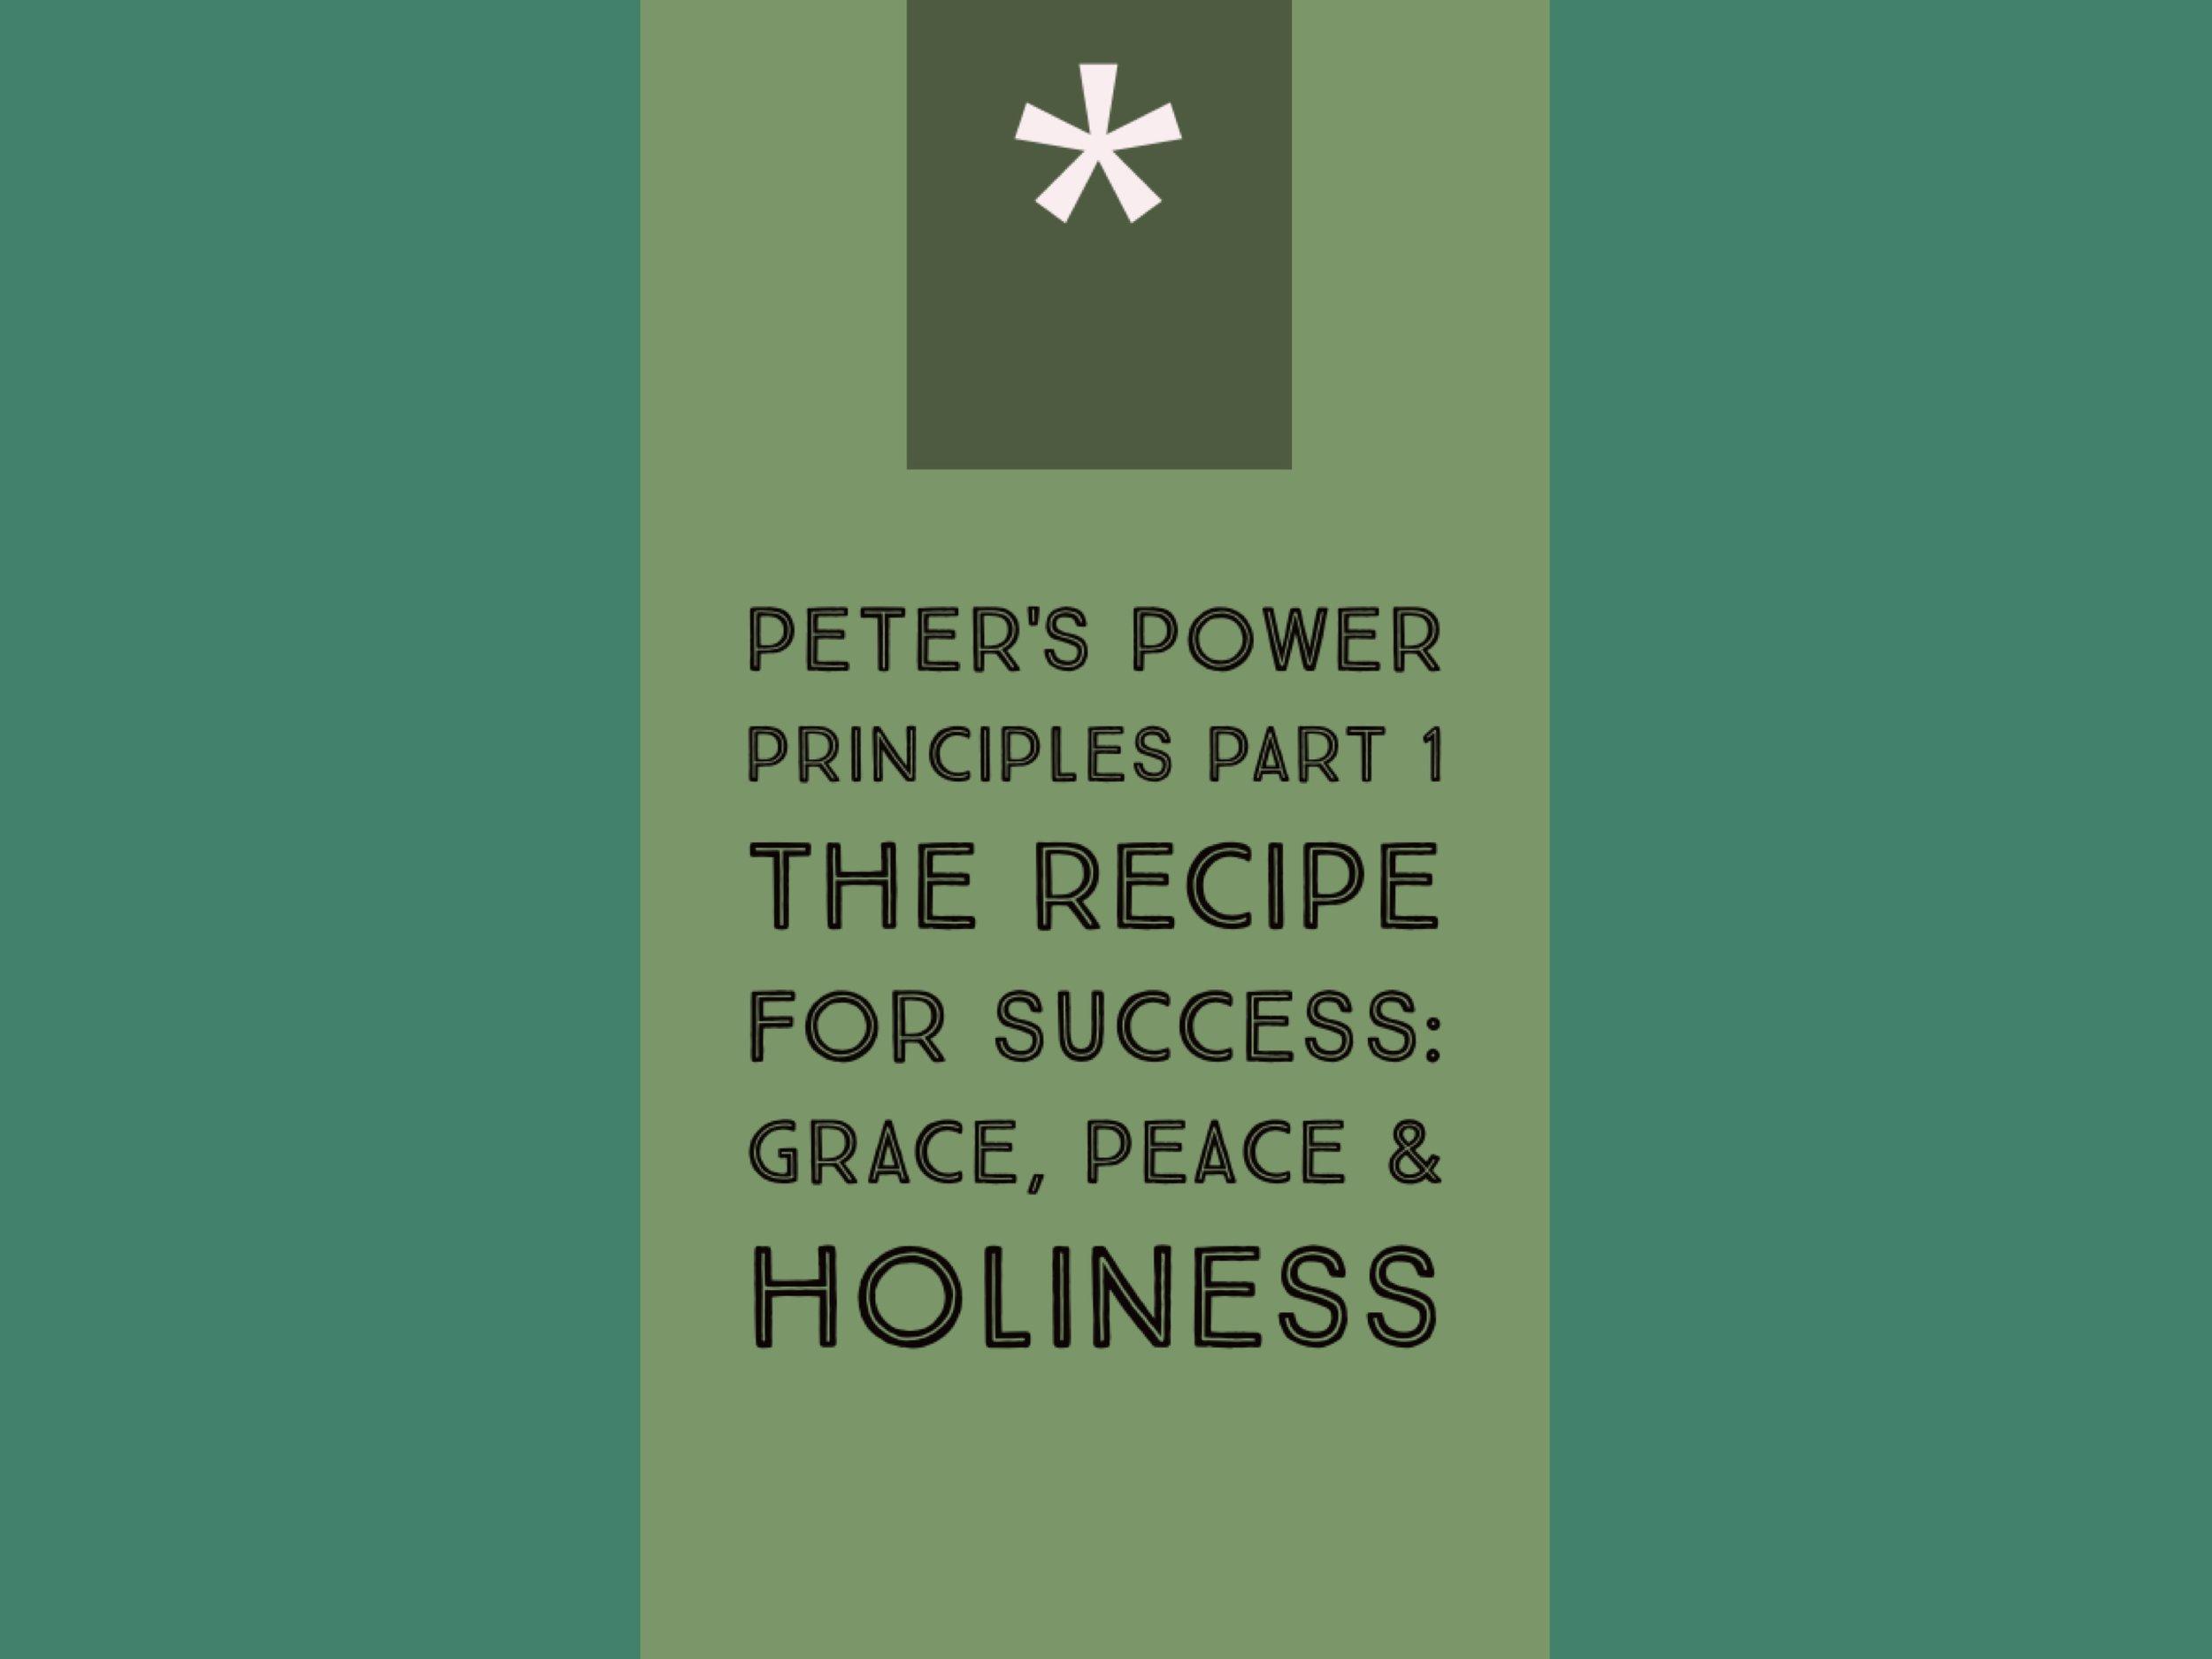 Peter's Power Principles